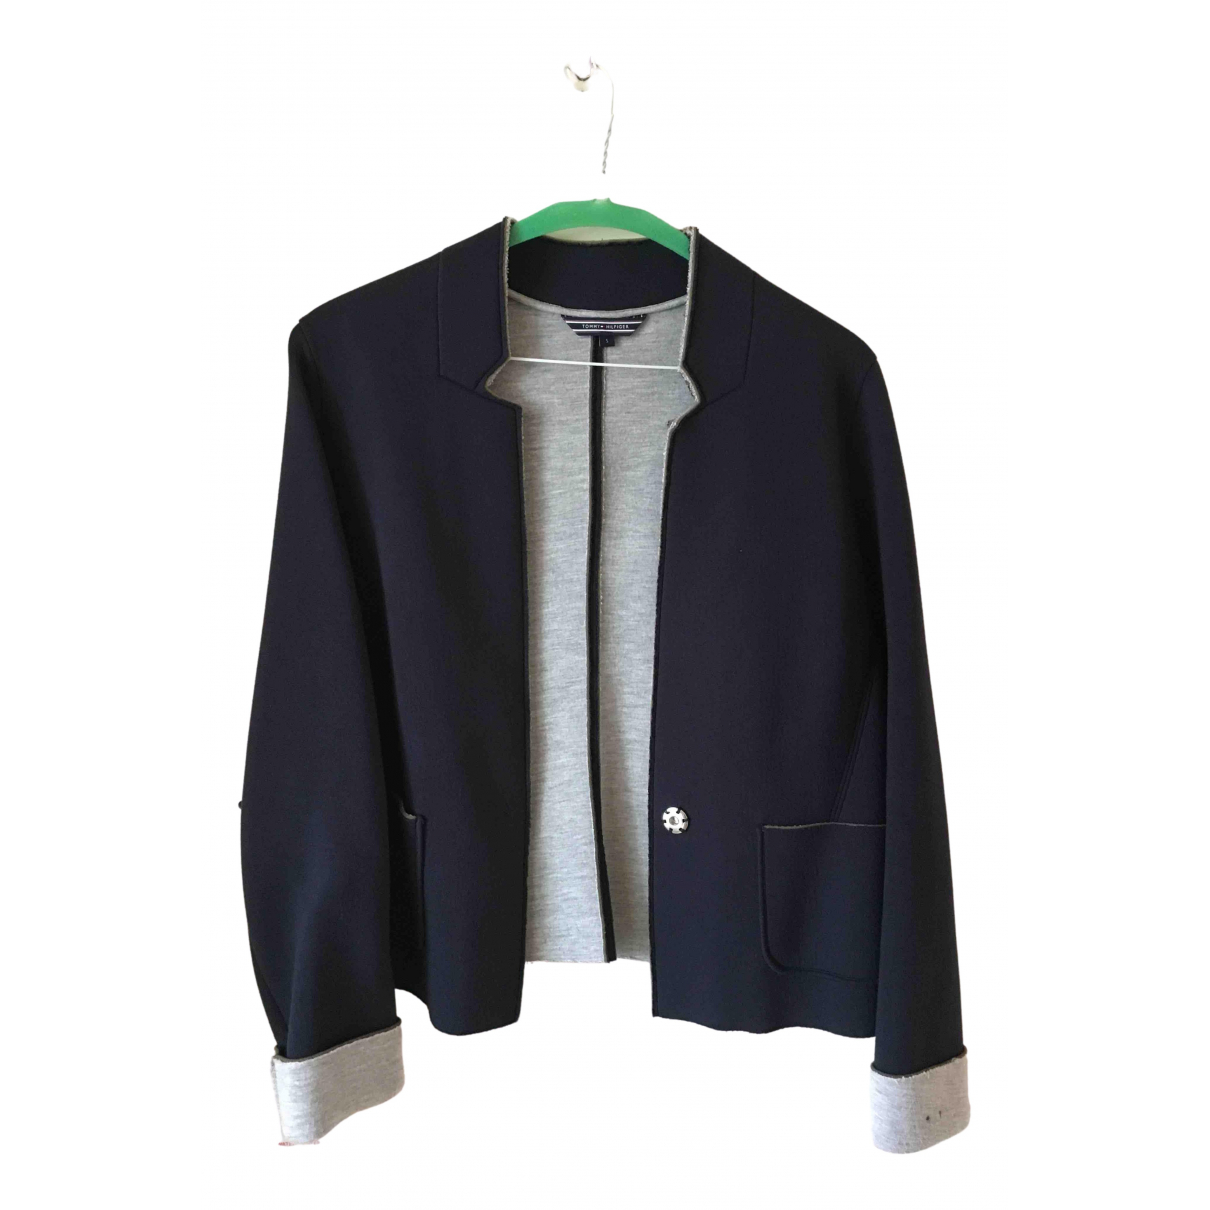 Tommy Hilfiger \N Navy jacket for Women S International